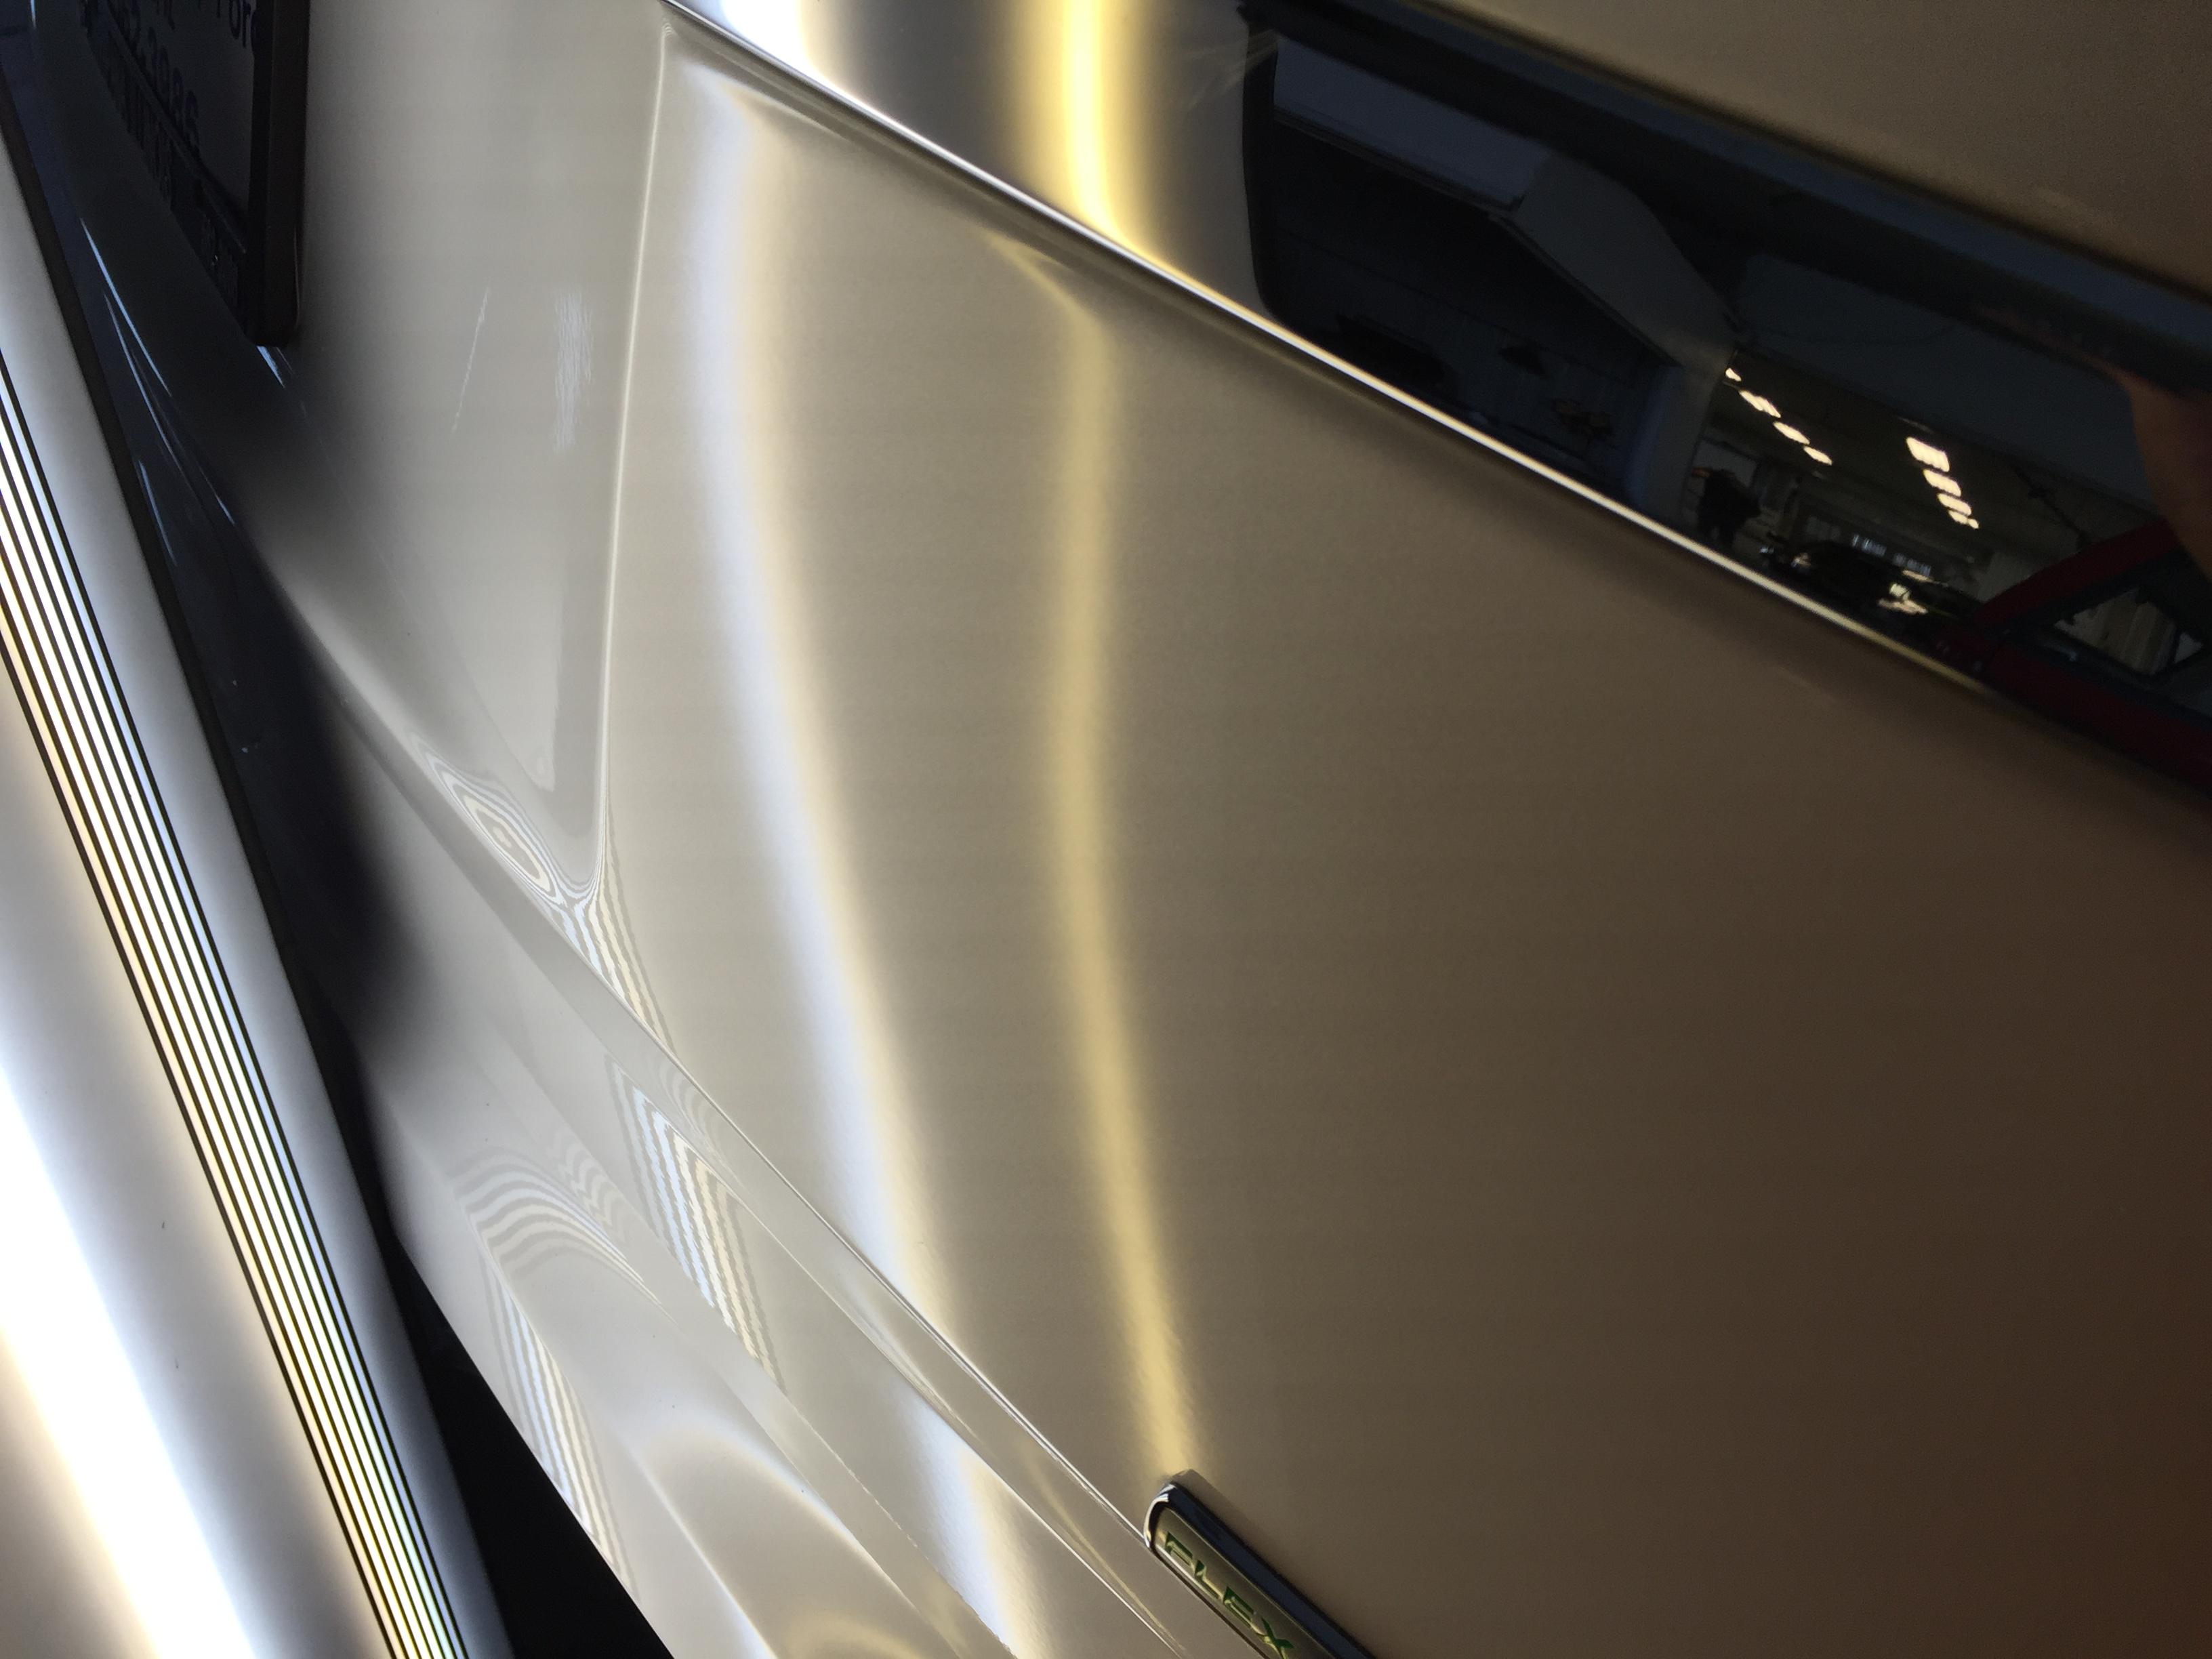 2014 Ford Explorer XLT Tri Coat White, Paintless Dent Repair Rear Gate, Springfield IL, Pana IL Taylorville IL